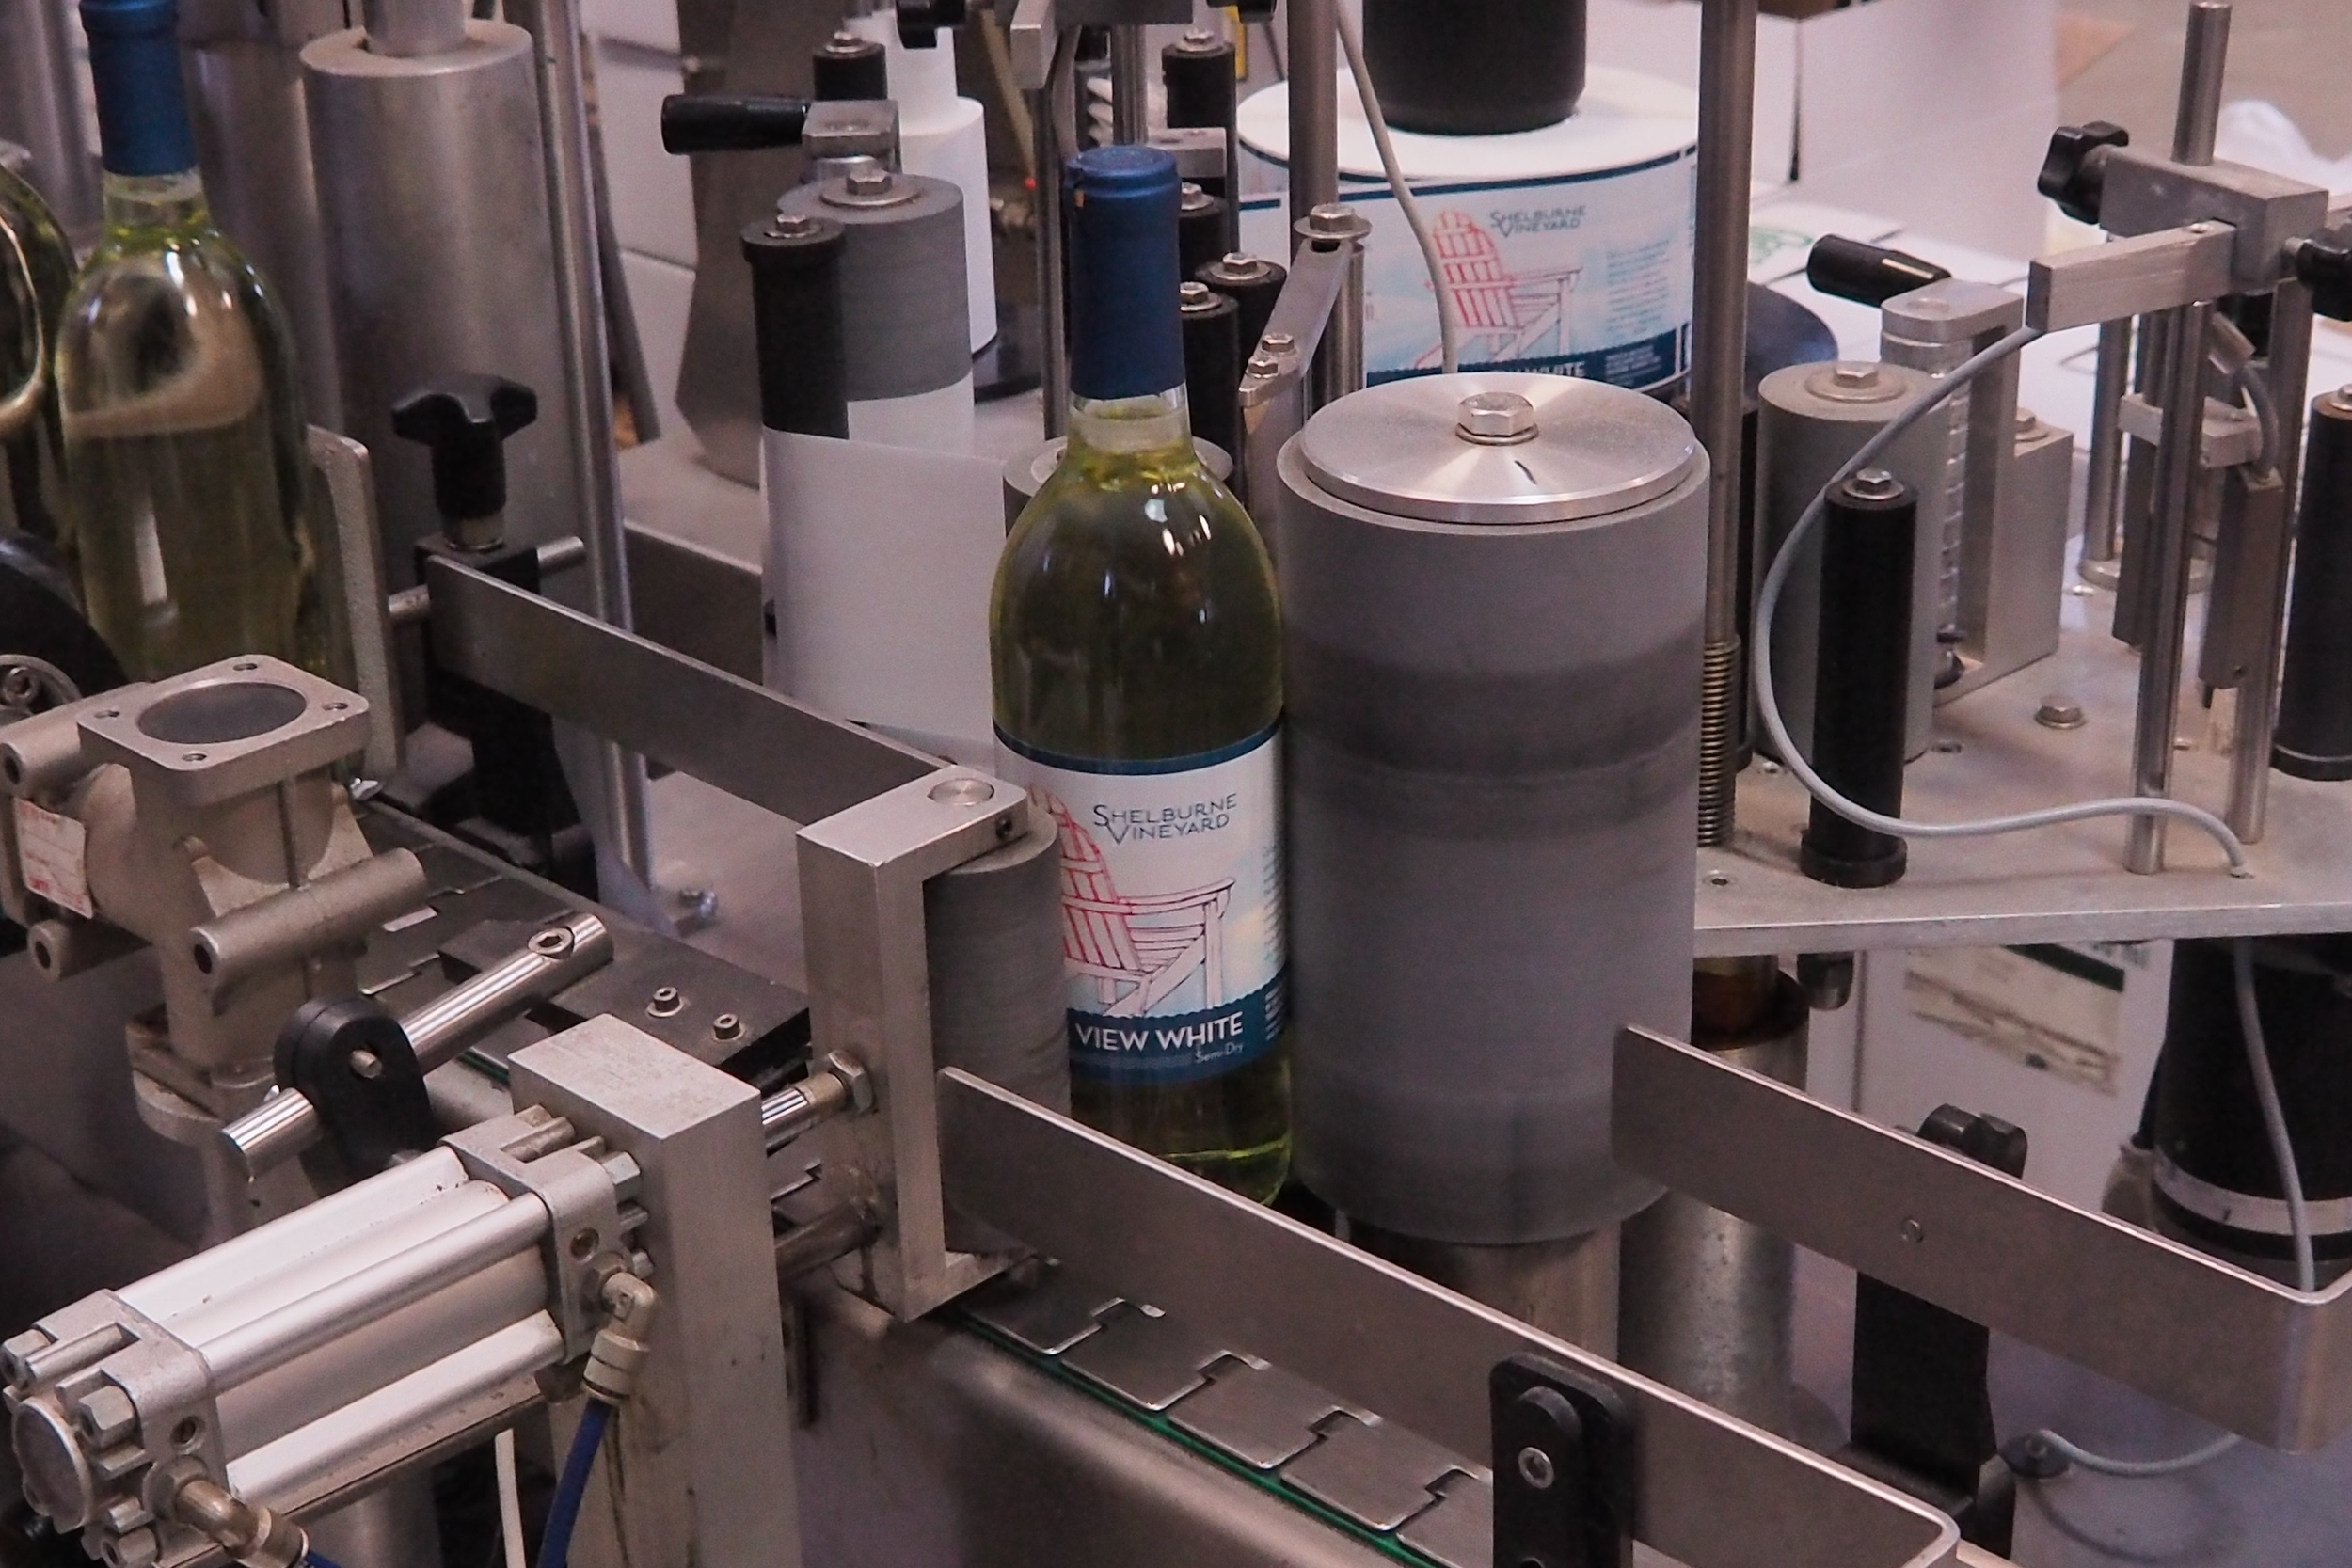 Bottling Lake View White wine